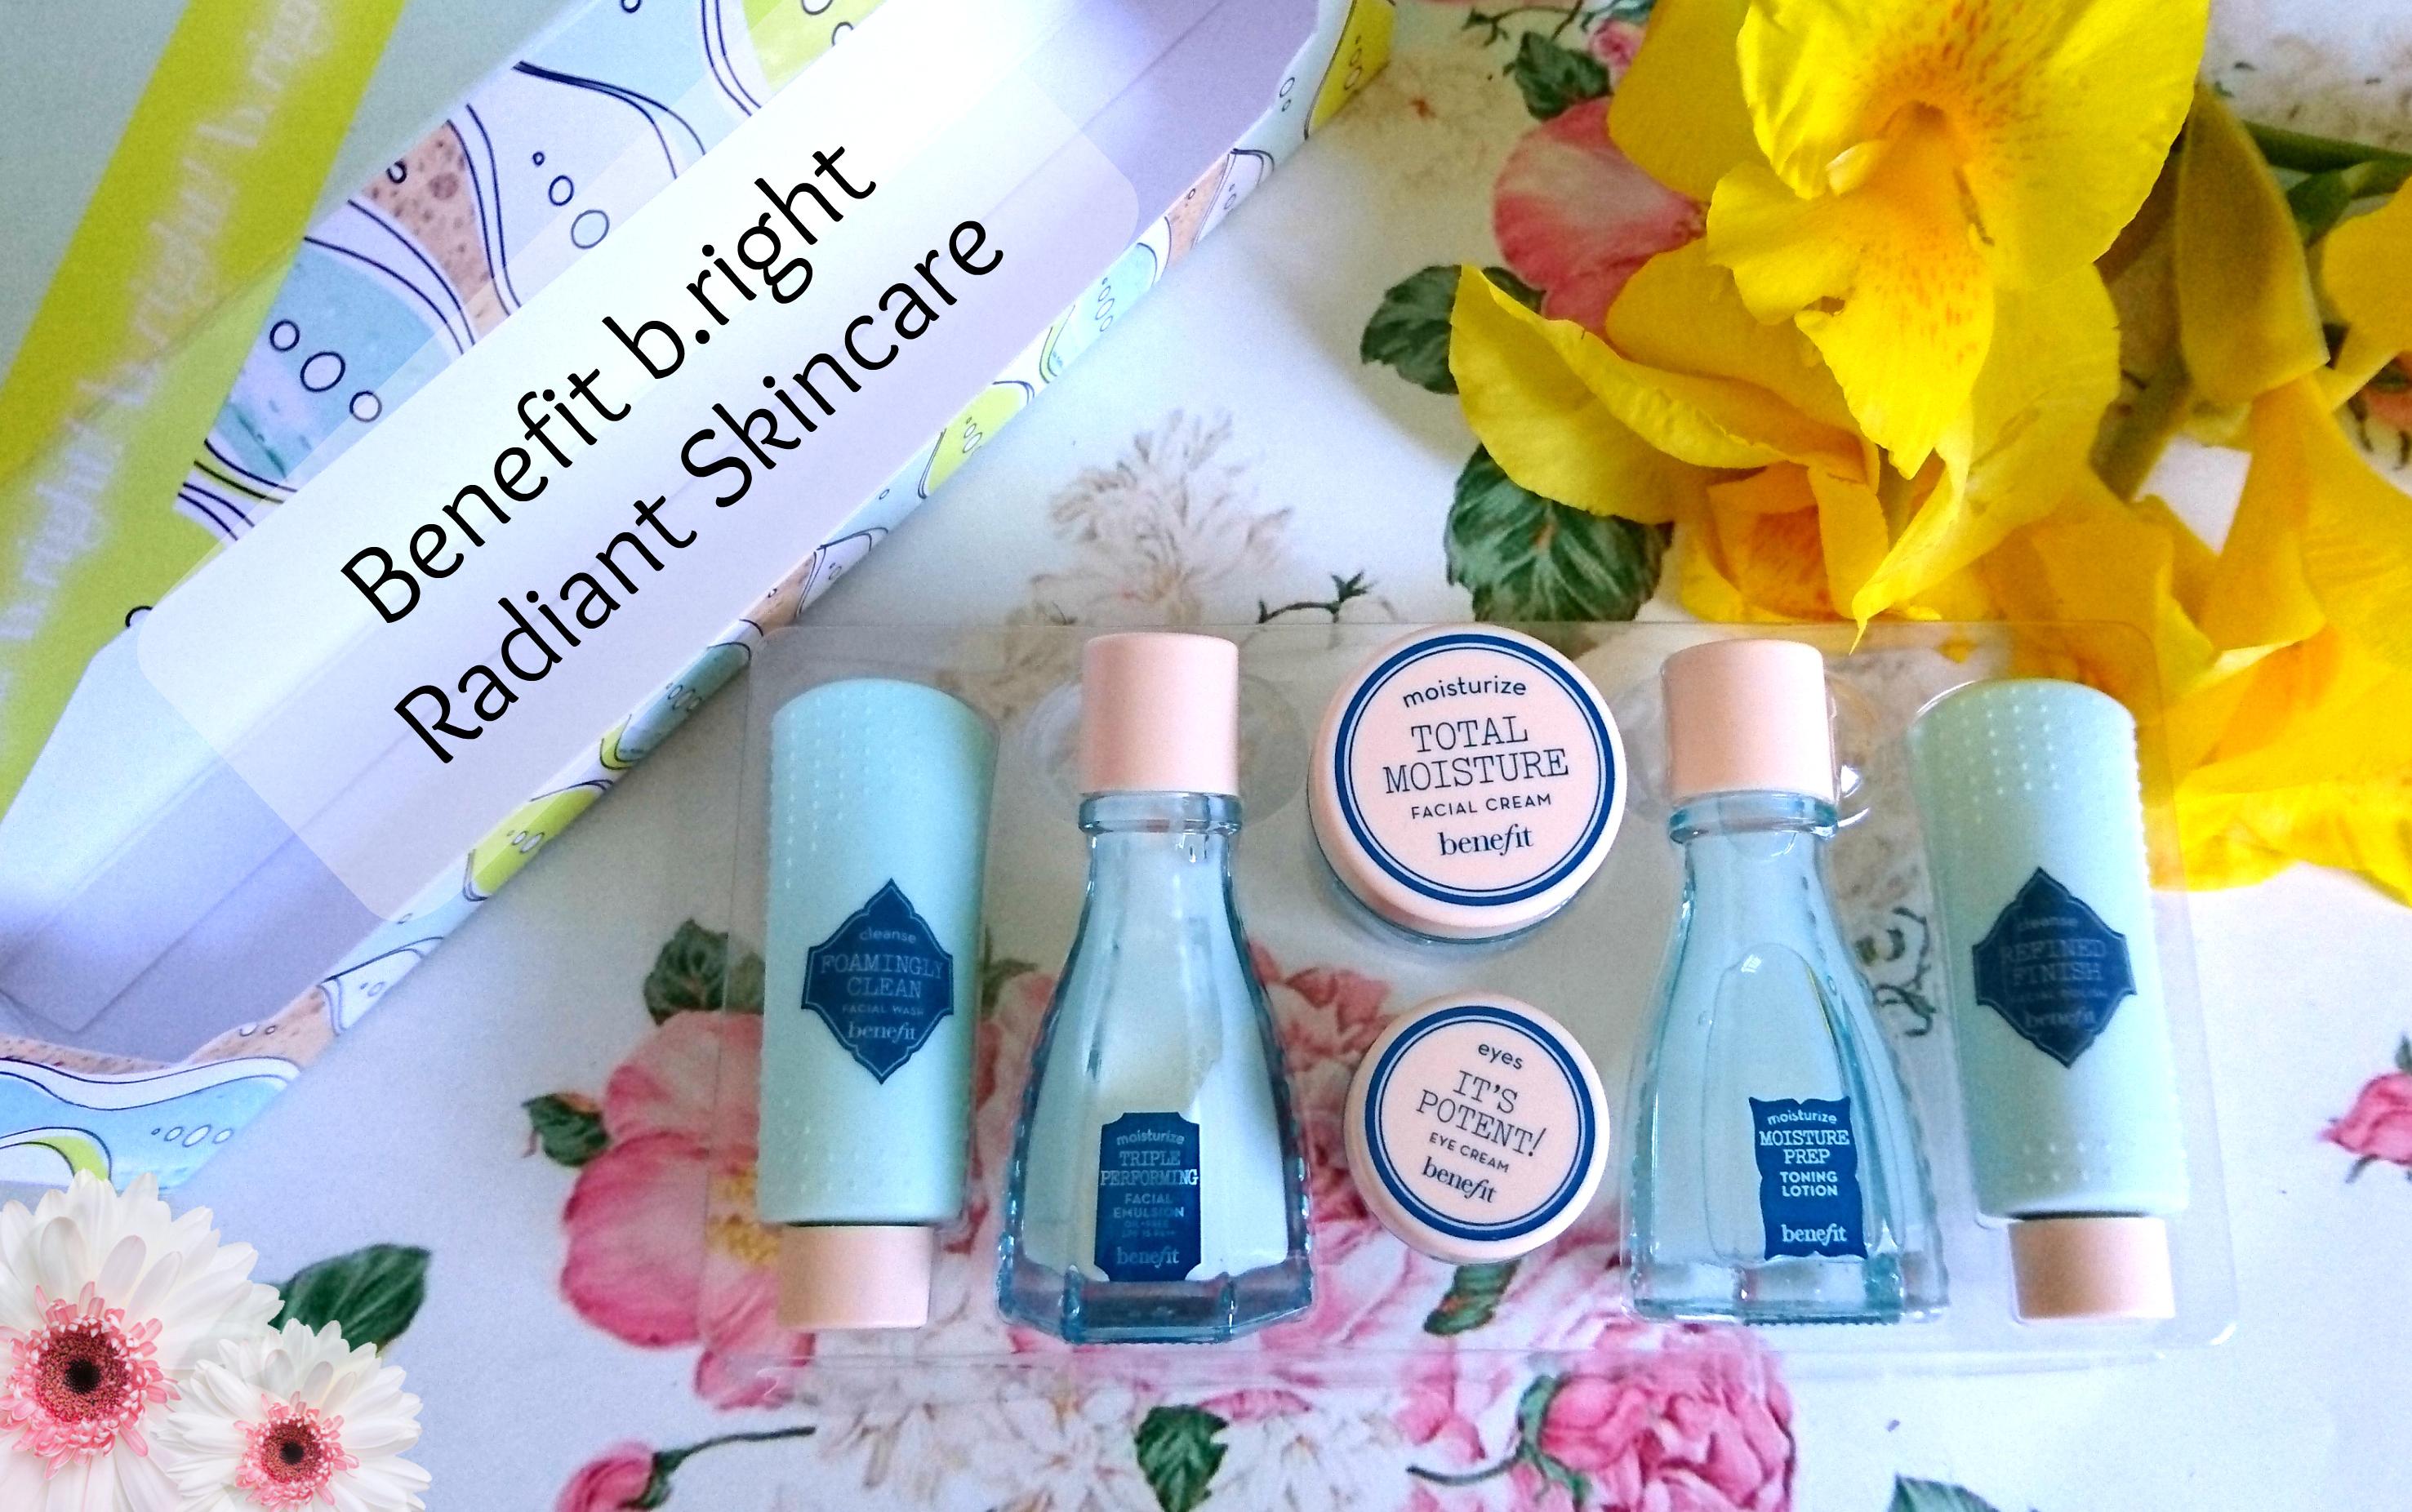 Benefit skincare